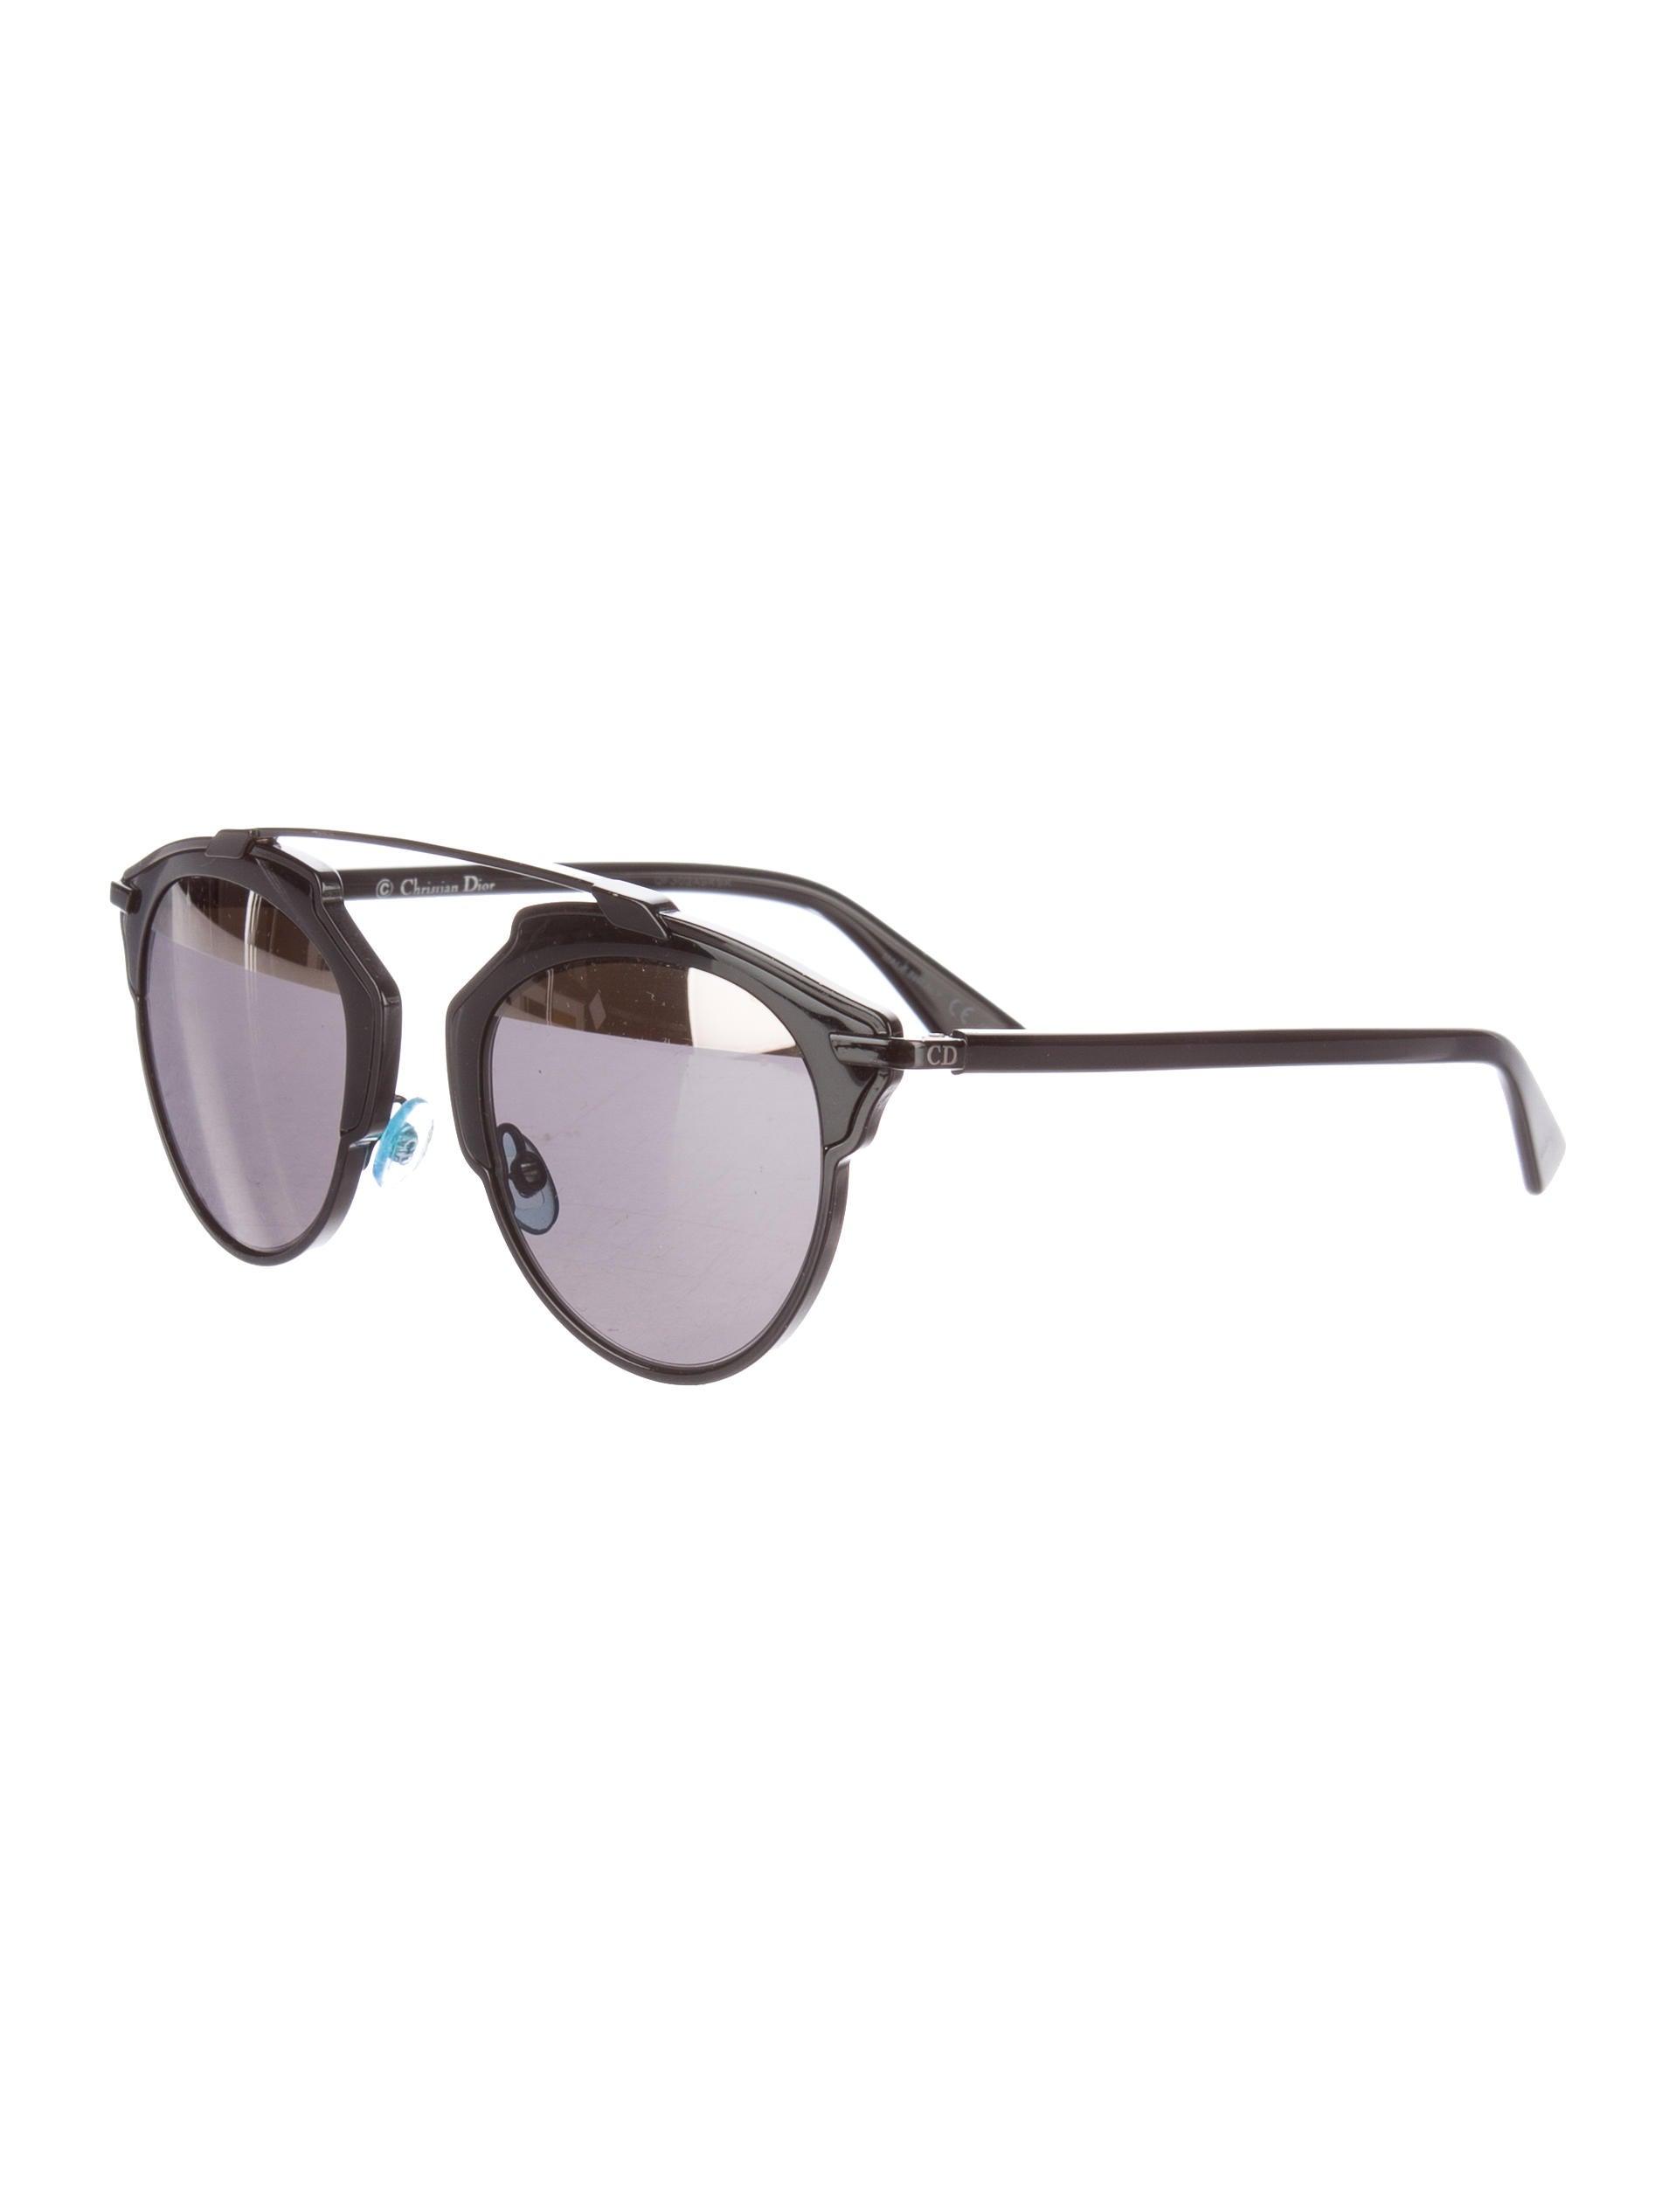 6a2f7f01fde Christian Dior So Real Split Sunglasses - Accessories - CHR44453